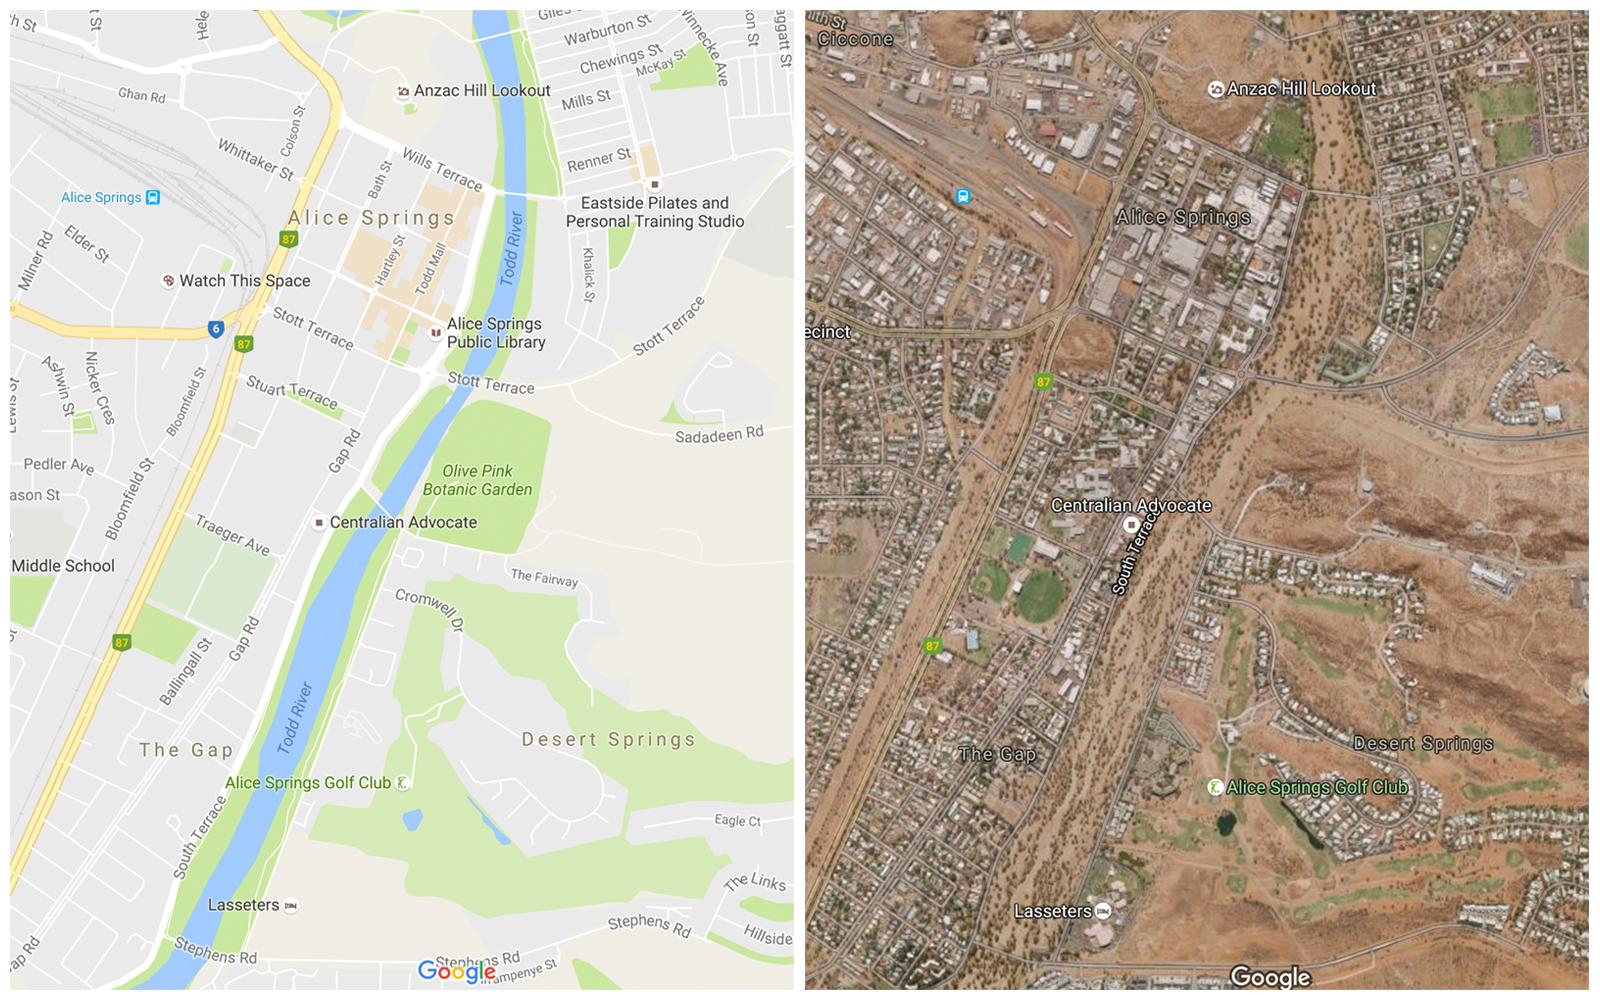 Google Maps vs Google satellite view of the Todd River